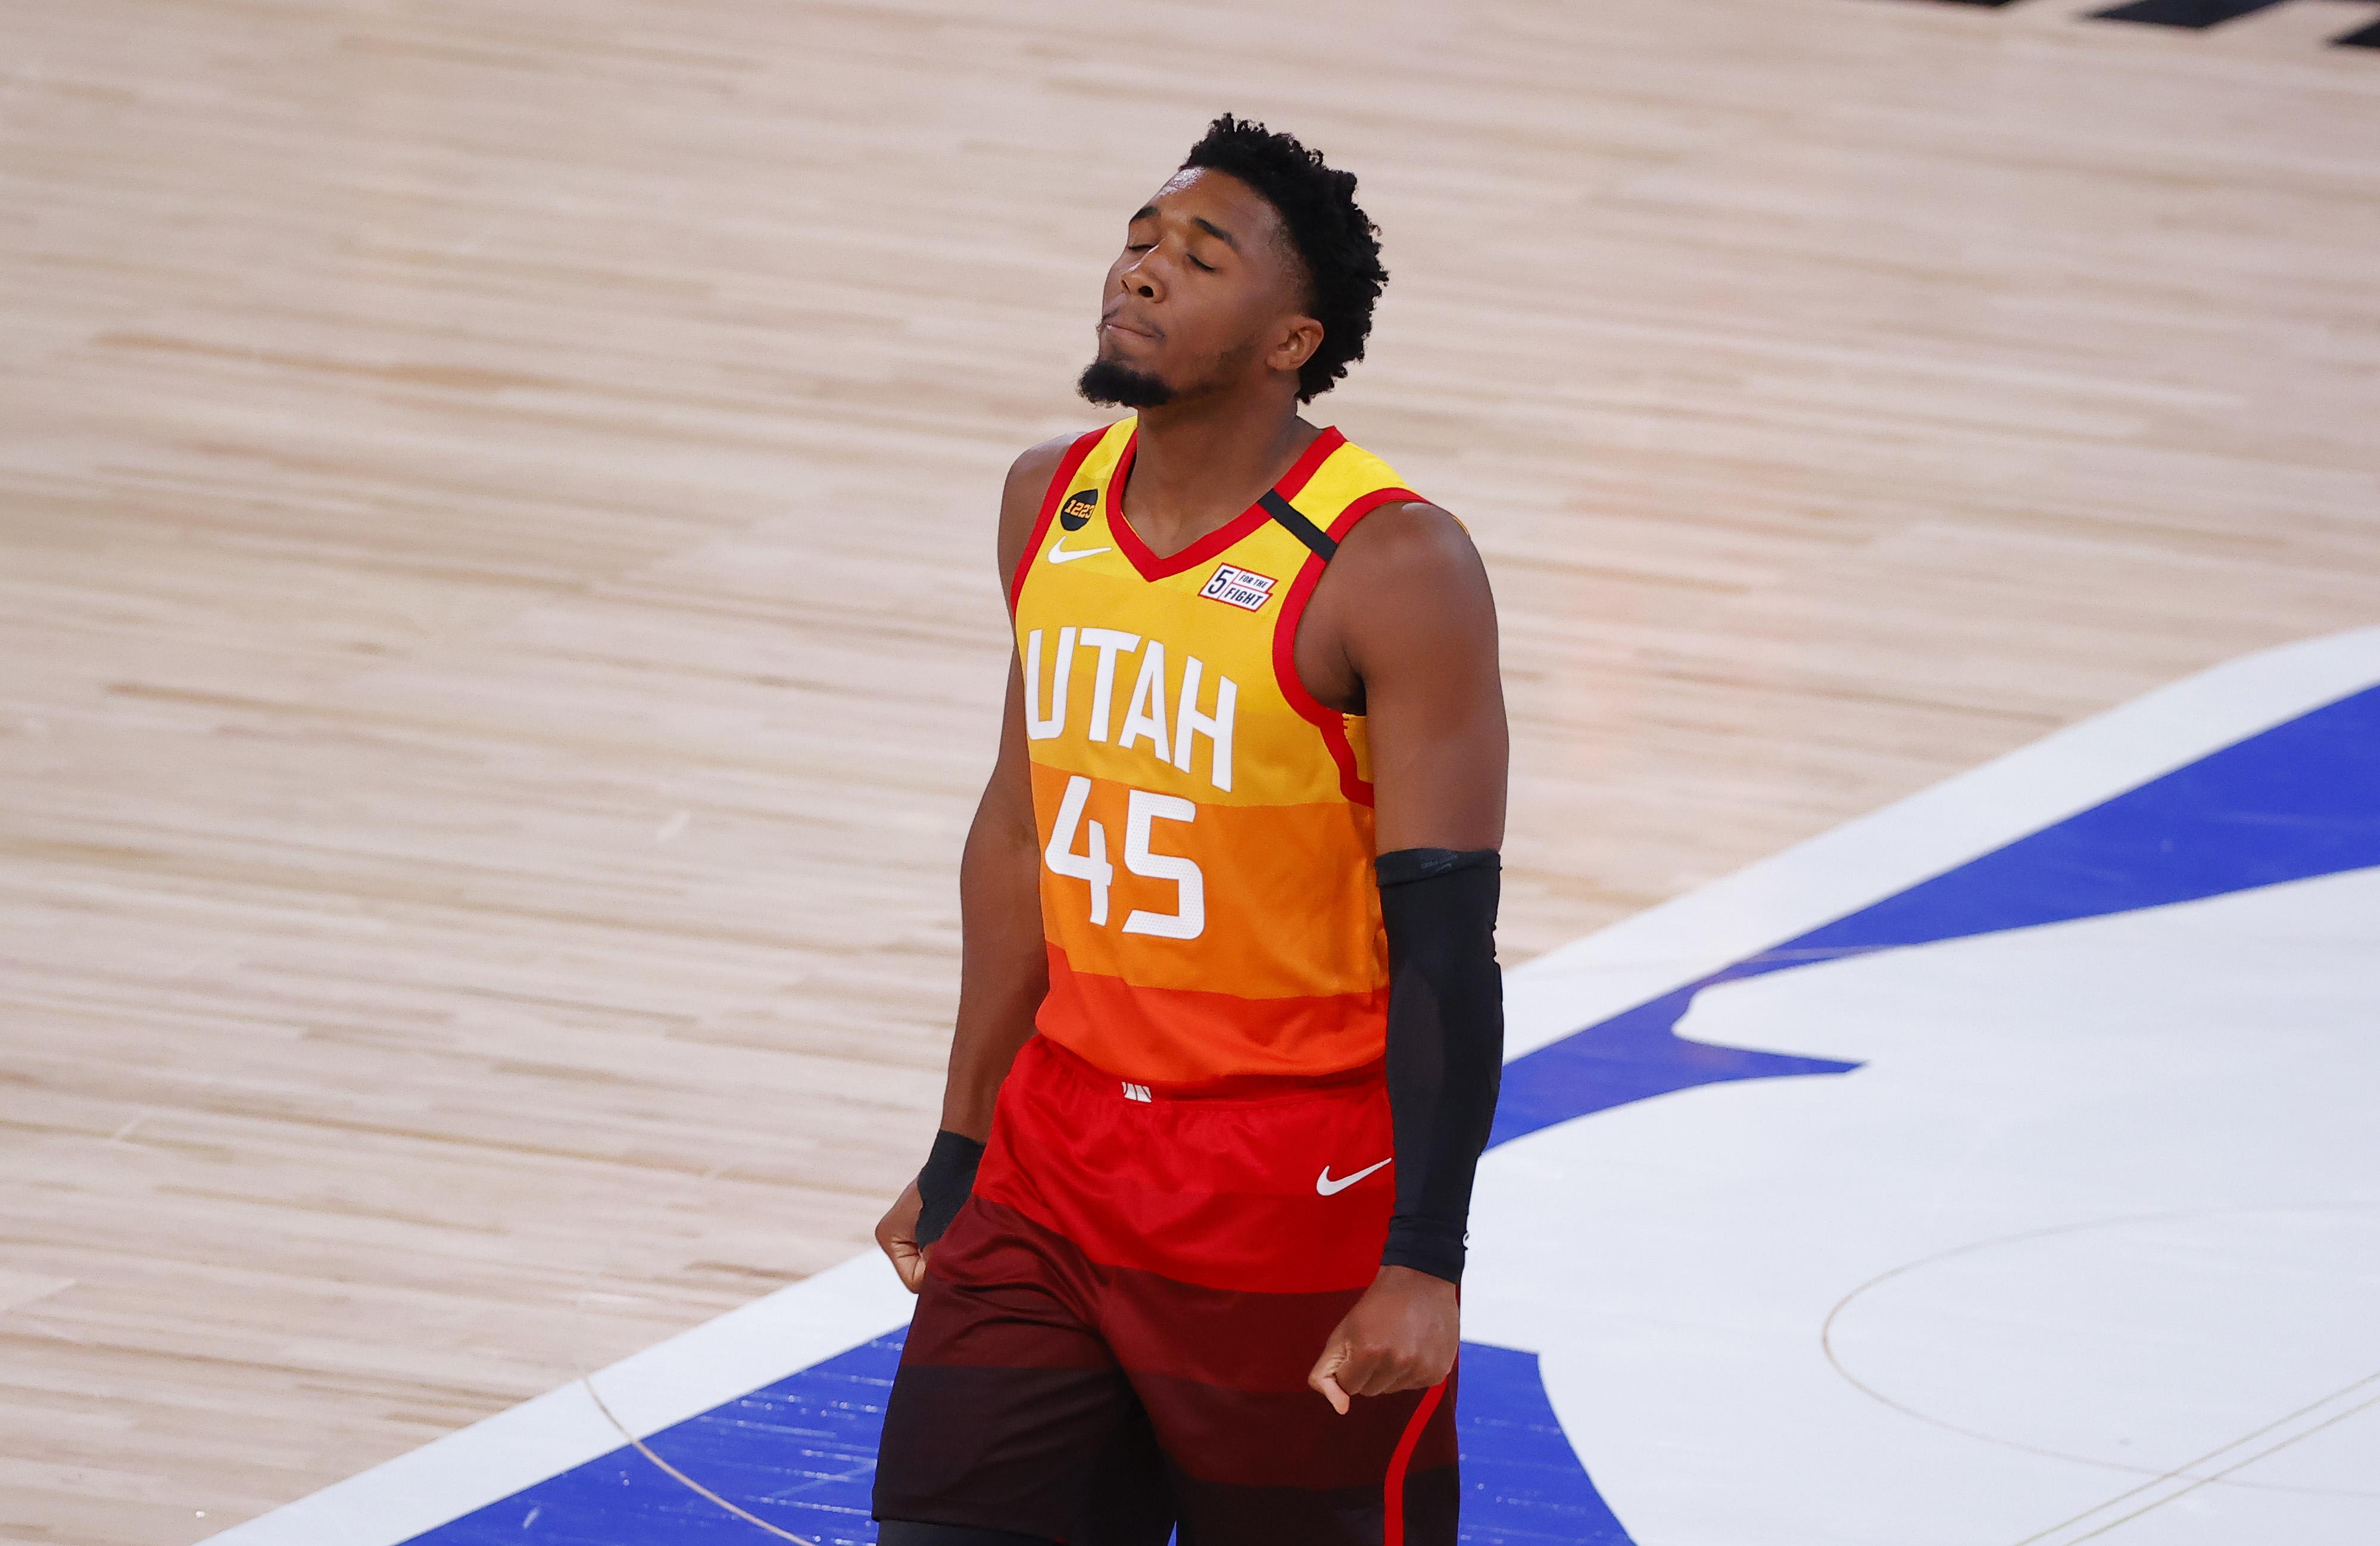 The Utah Jazz's Donovan Mitchell